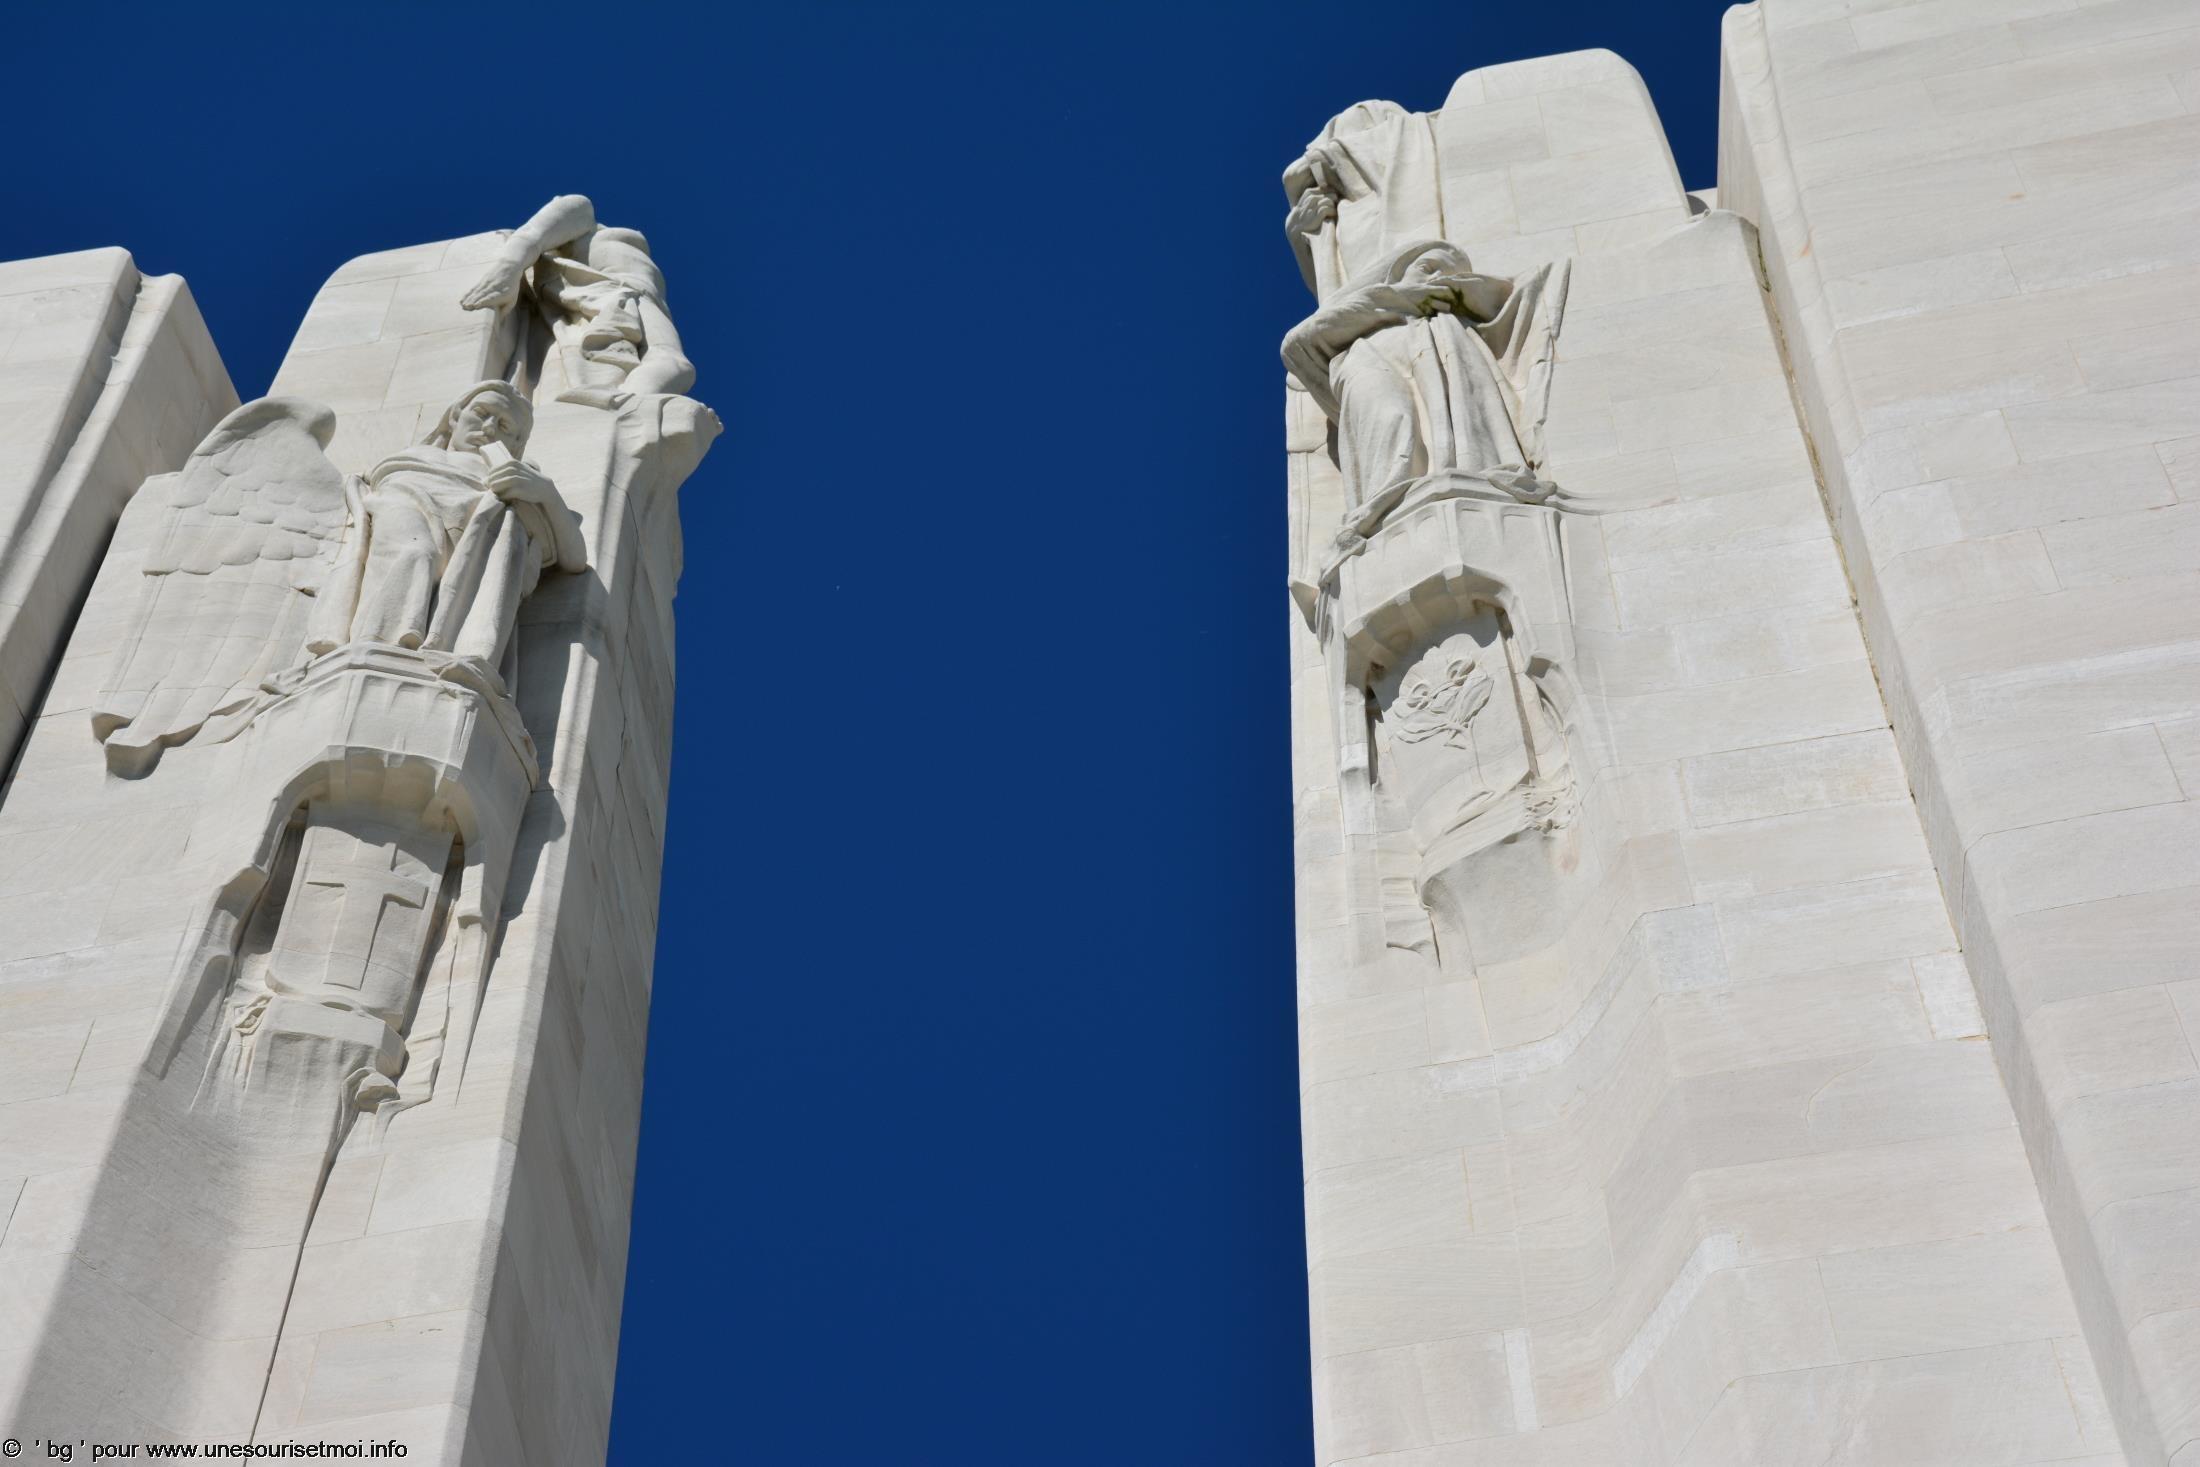 memorial-canadien-vimy-62580-premiere-guerre-mondiale_3